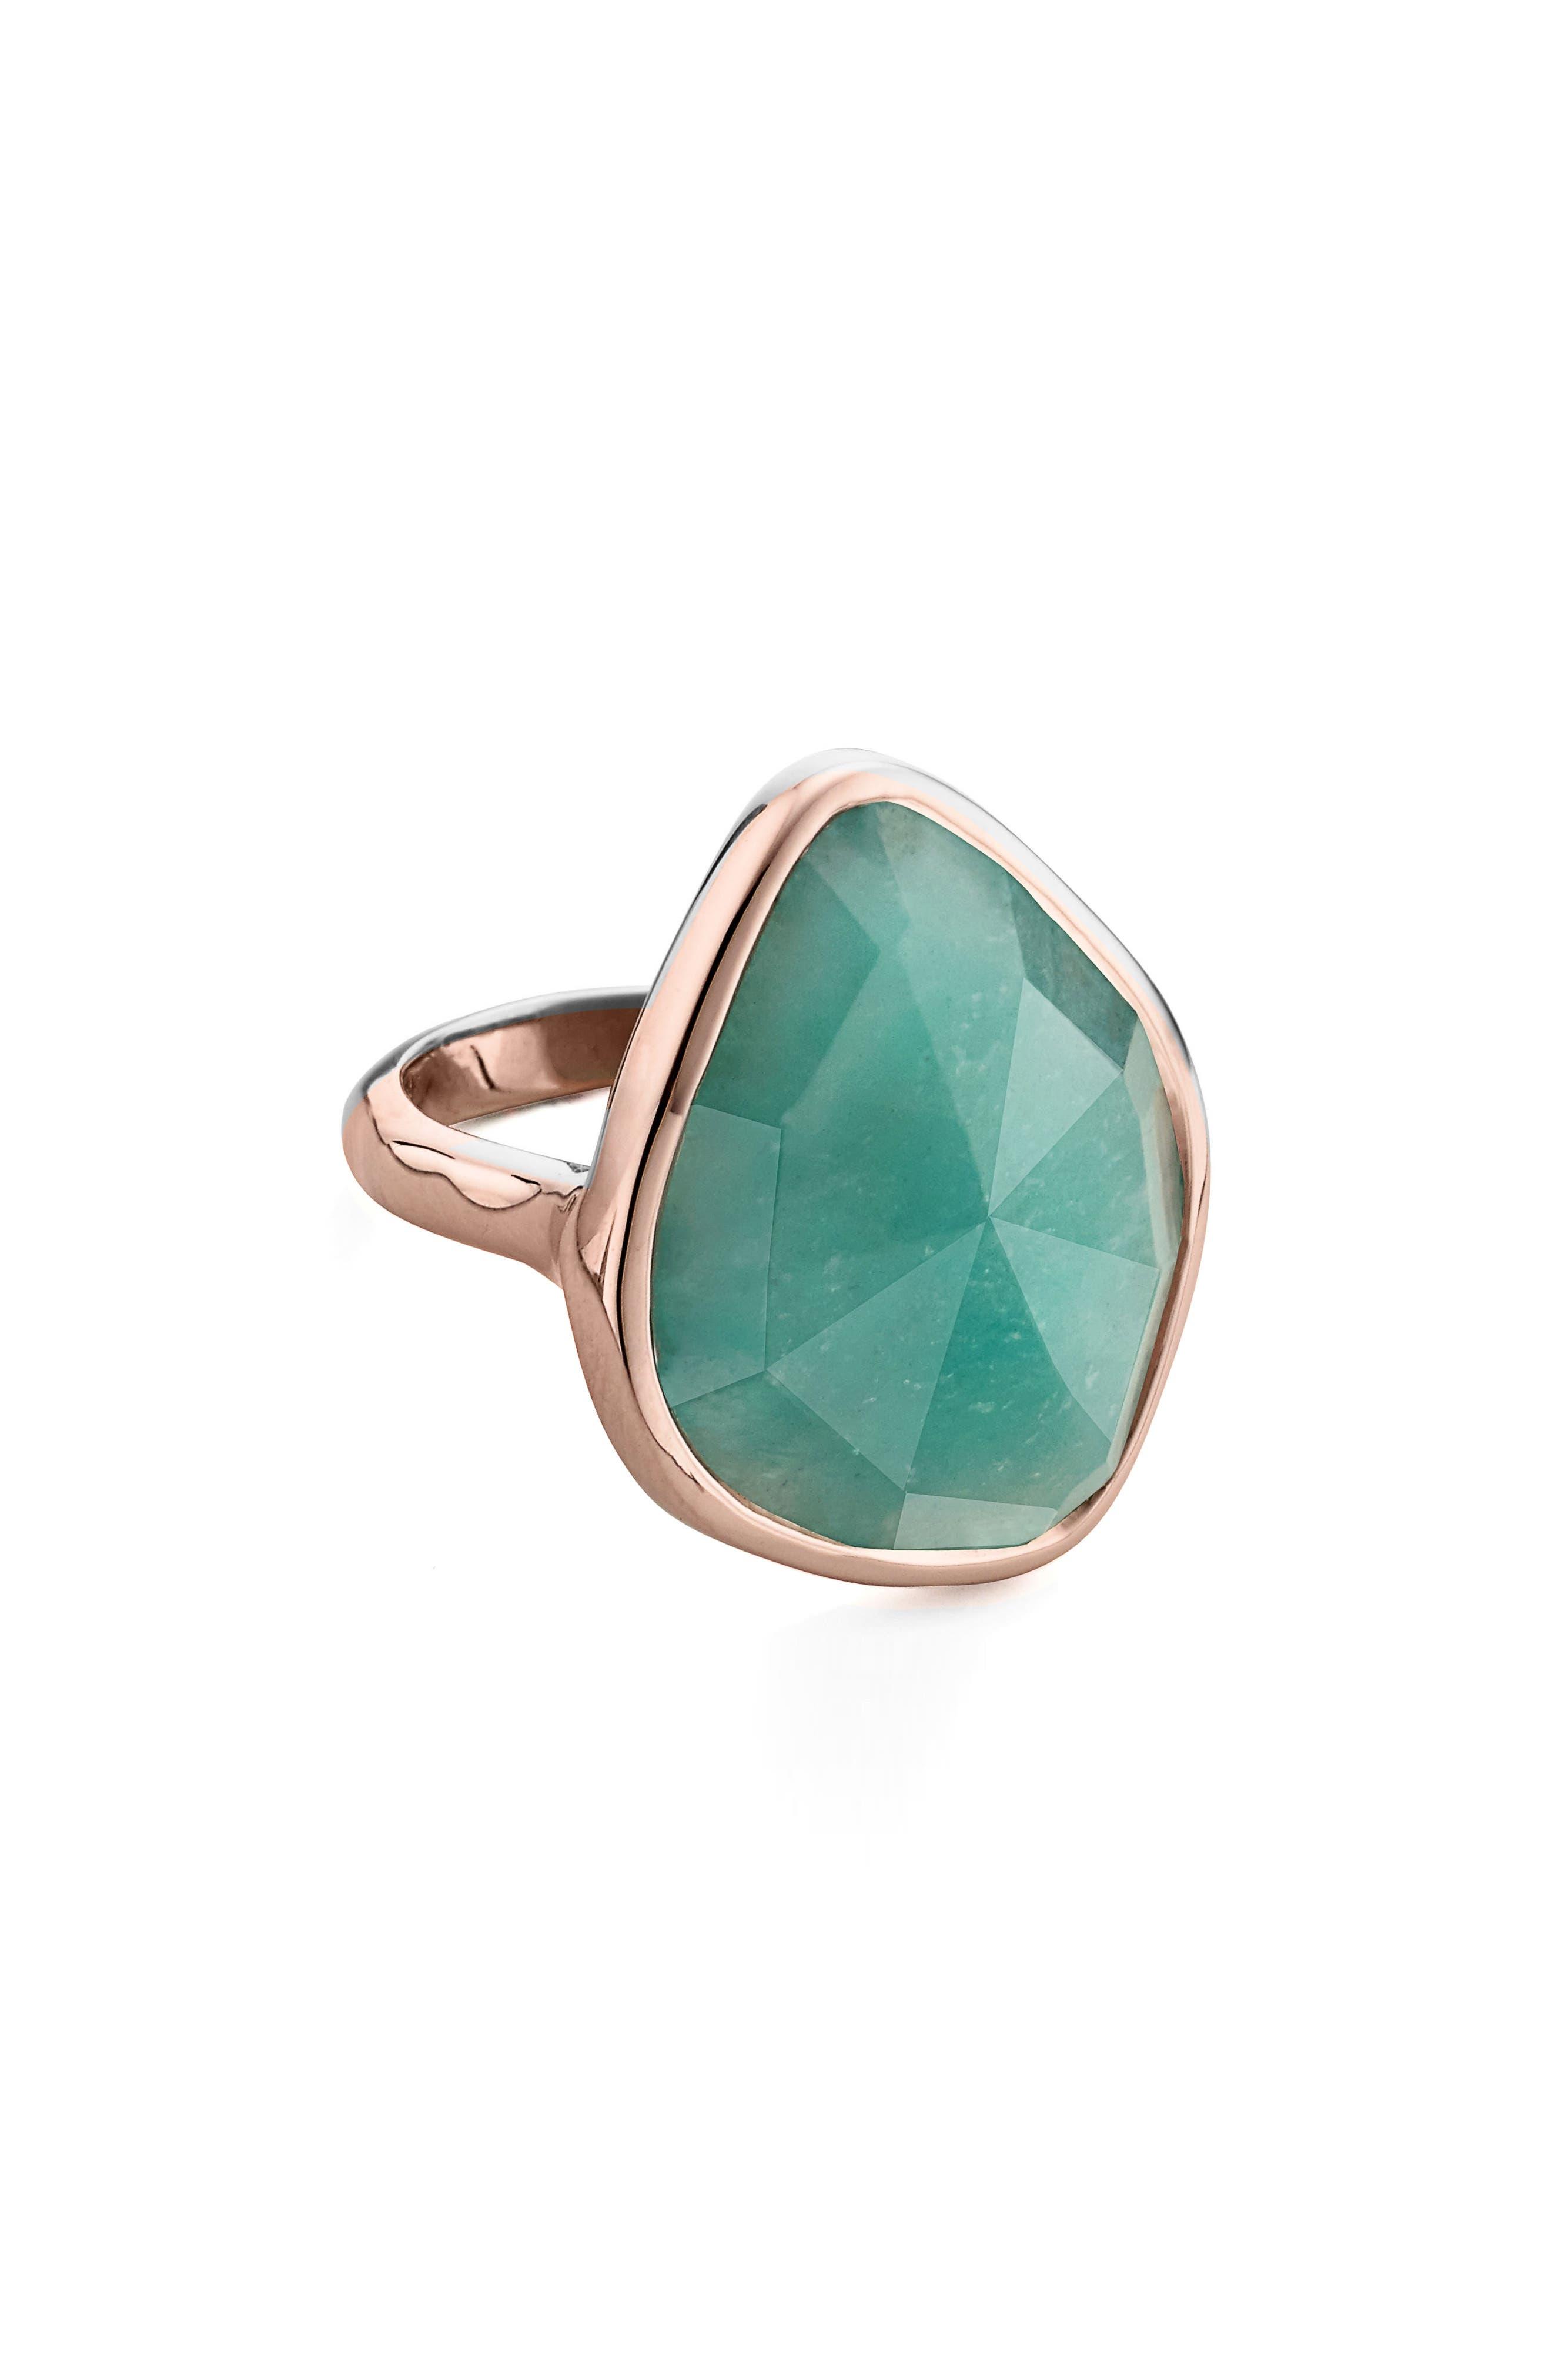 Main Image - Monica Vinader Siren Nugget Semiprecious Stone Cocktail Ring